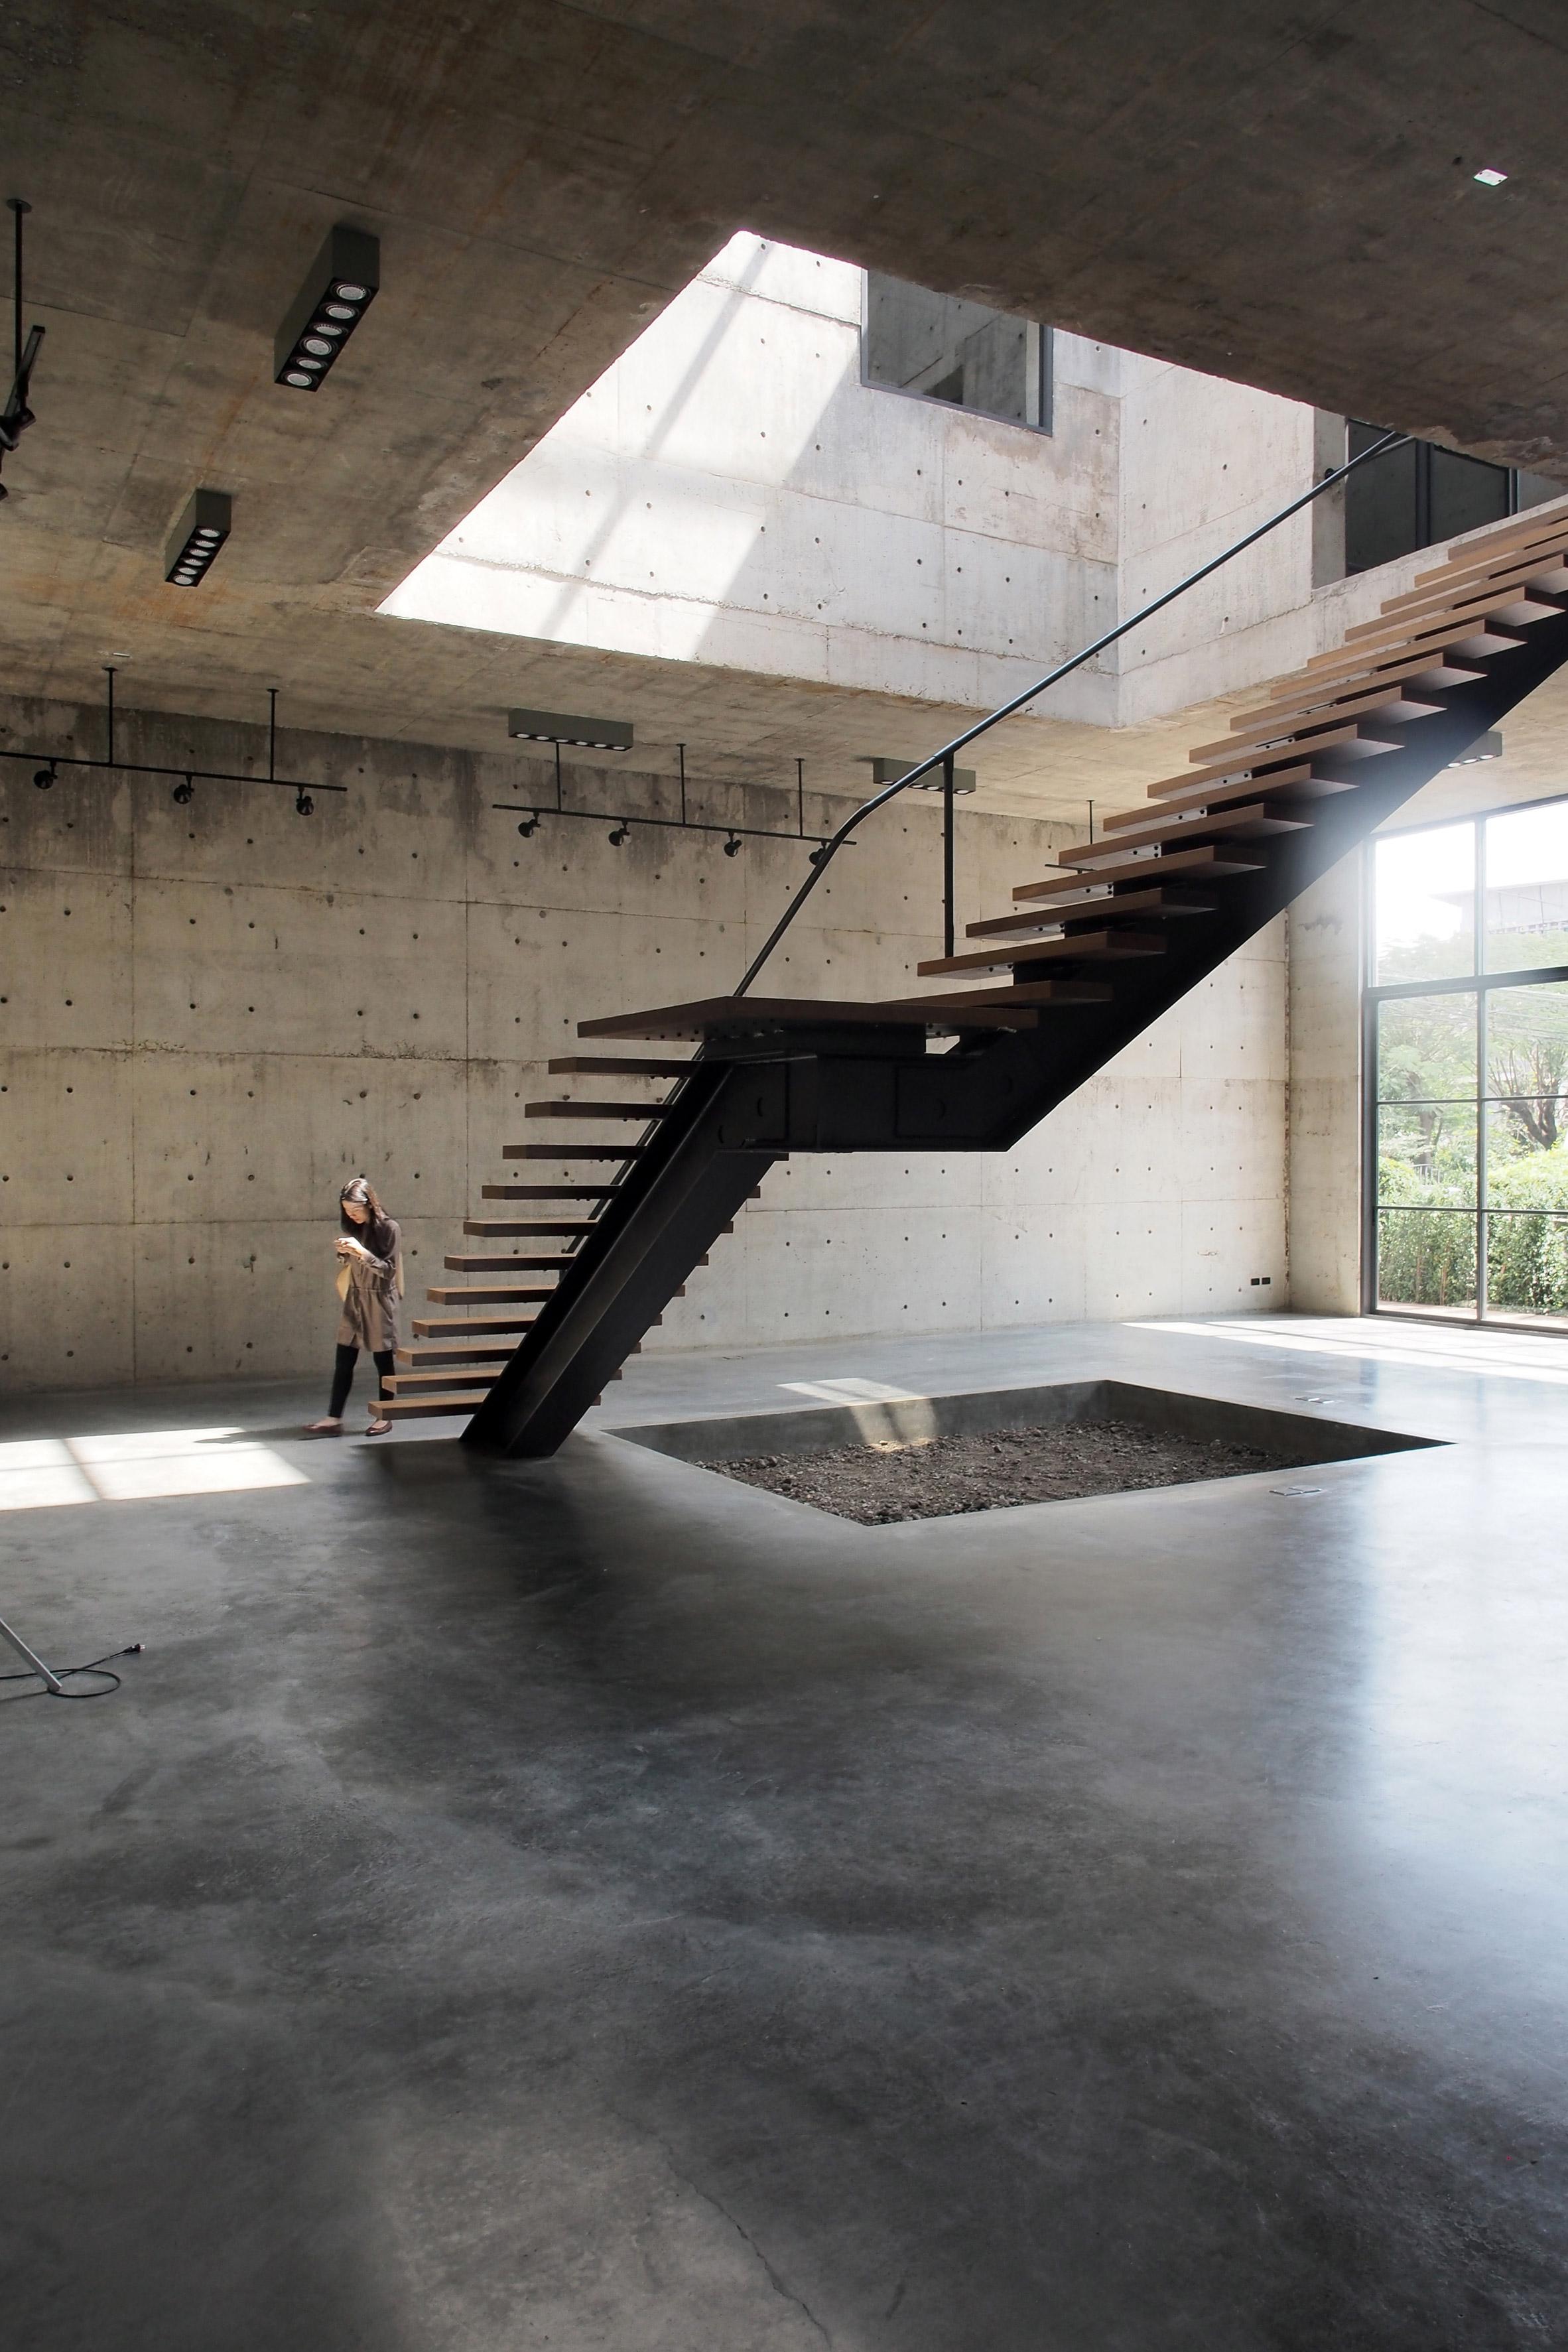 solid-concrete-gallery-as-living-artwork-aswa-architecture-bangkok-thailand_dezeen_2364_col_12.jpg